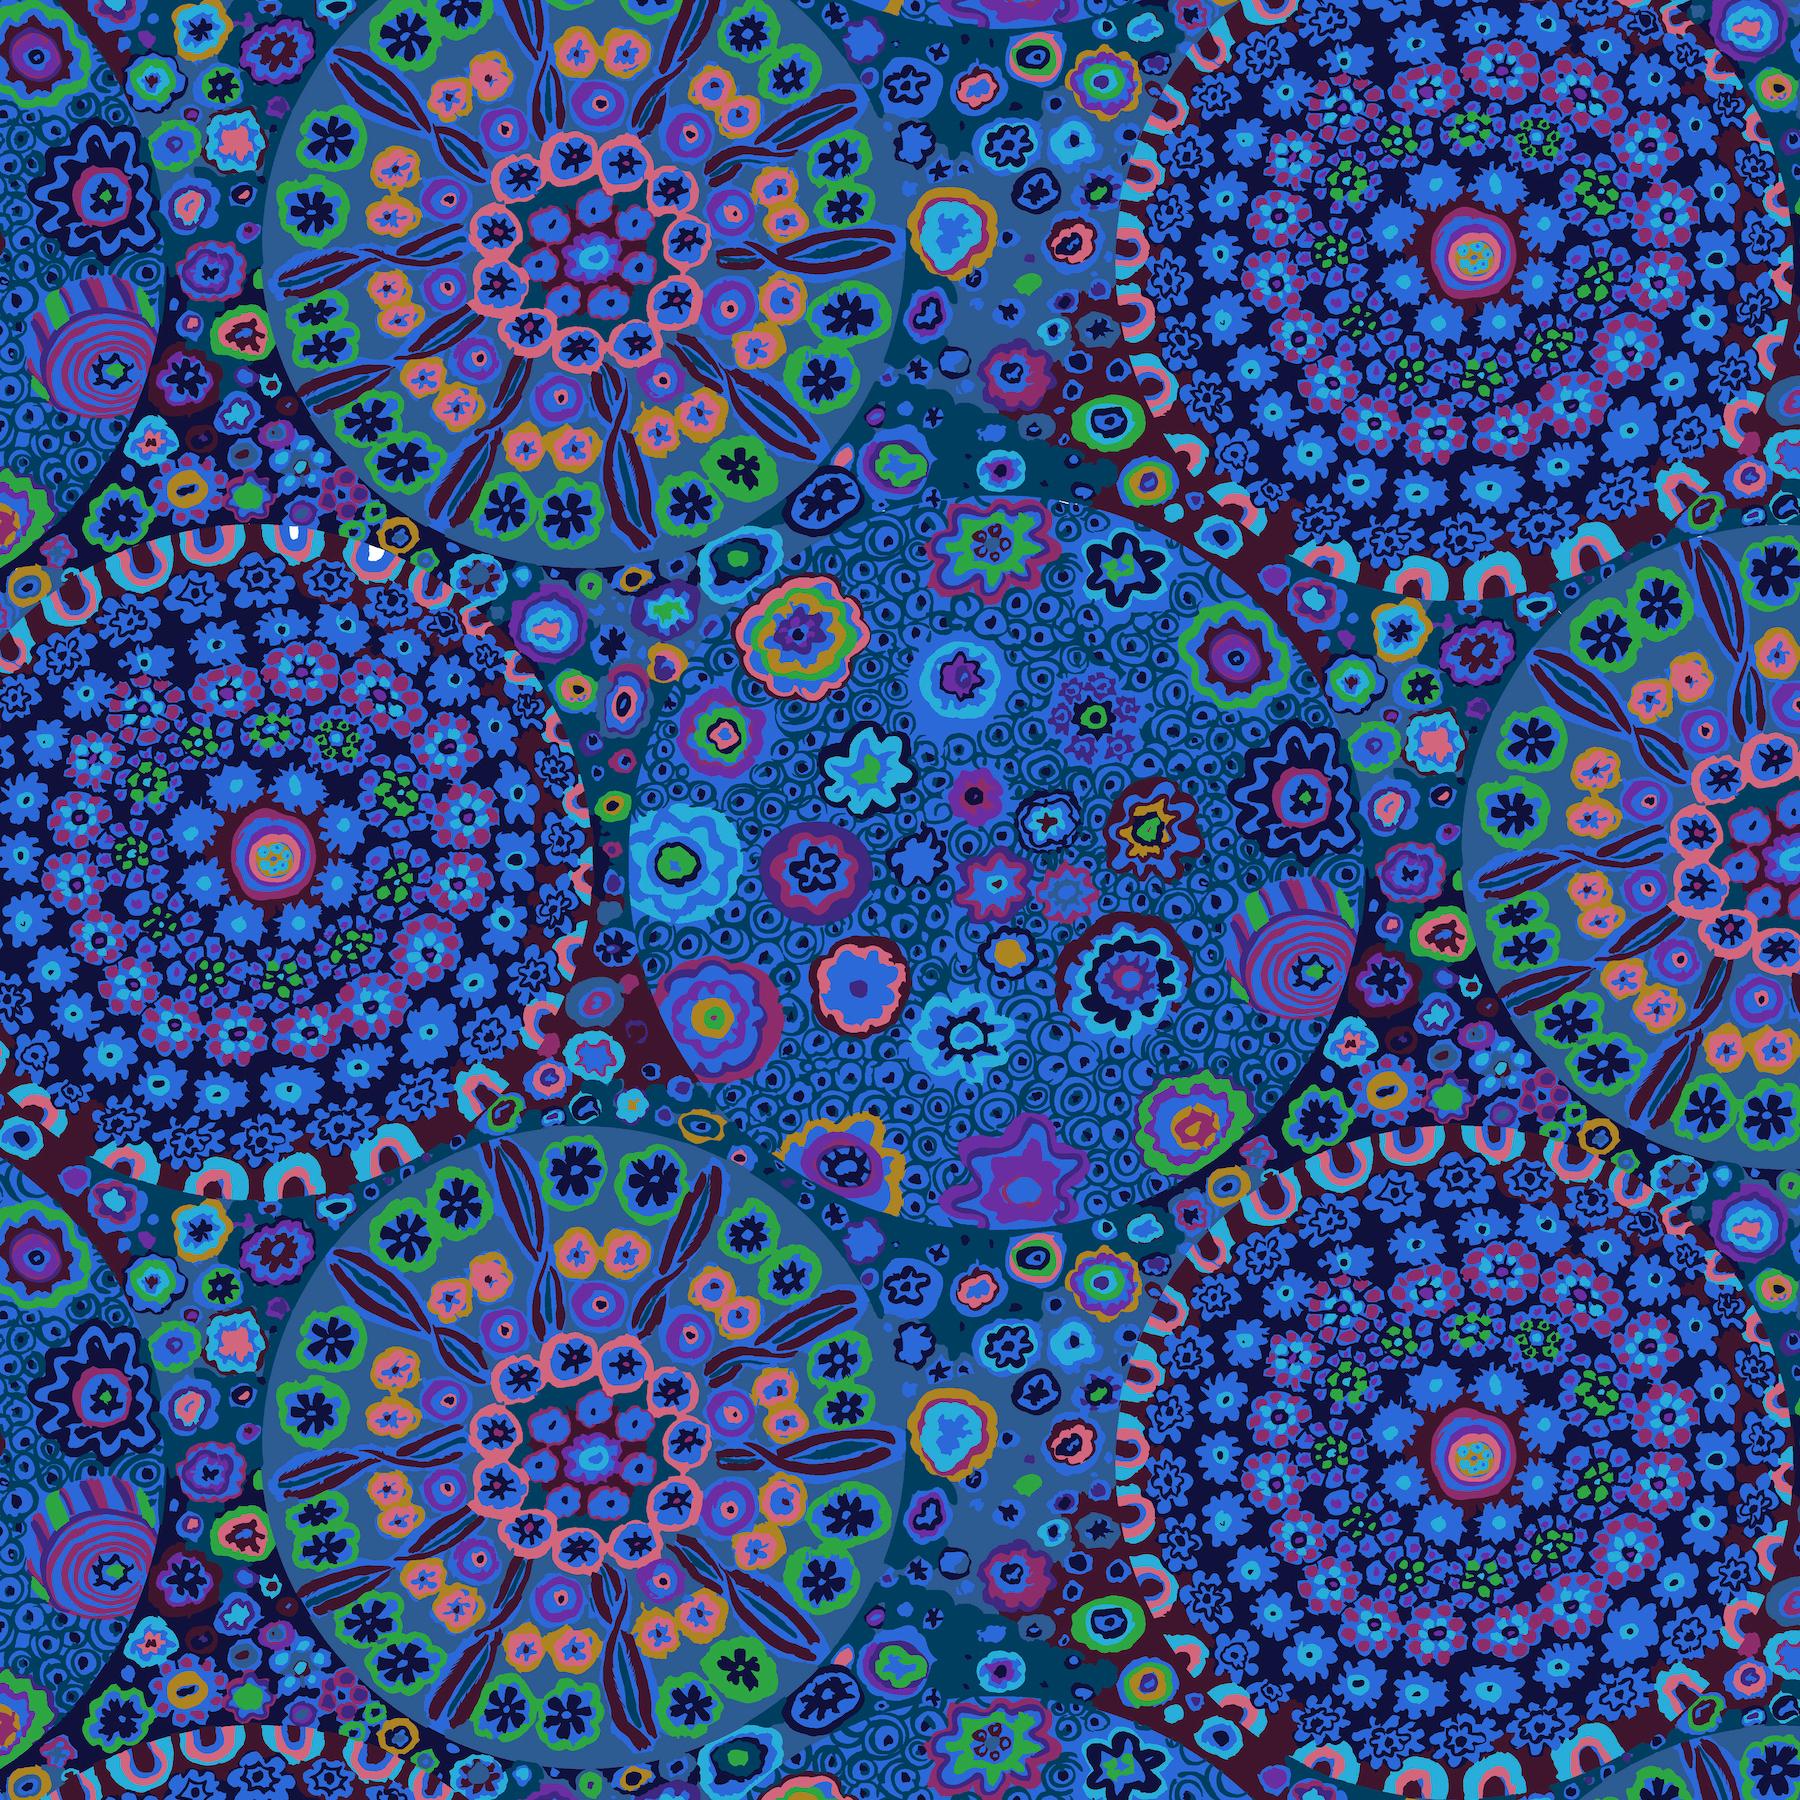 Millefiore - WIDE BACK QBGP006 - Blue